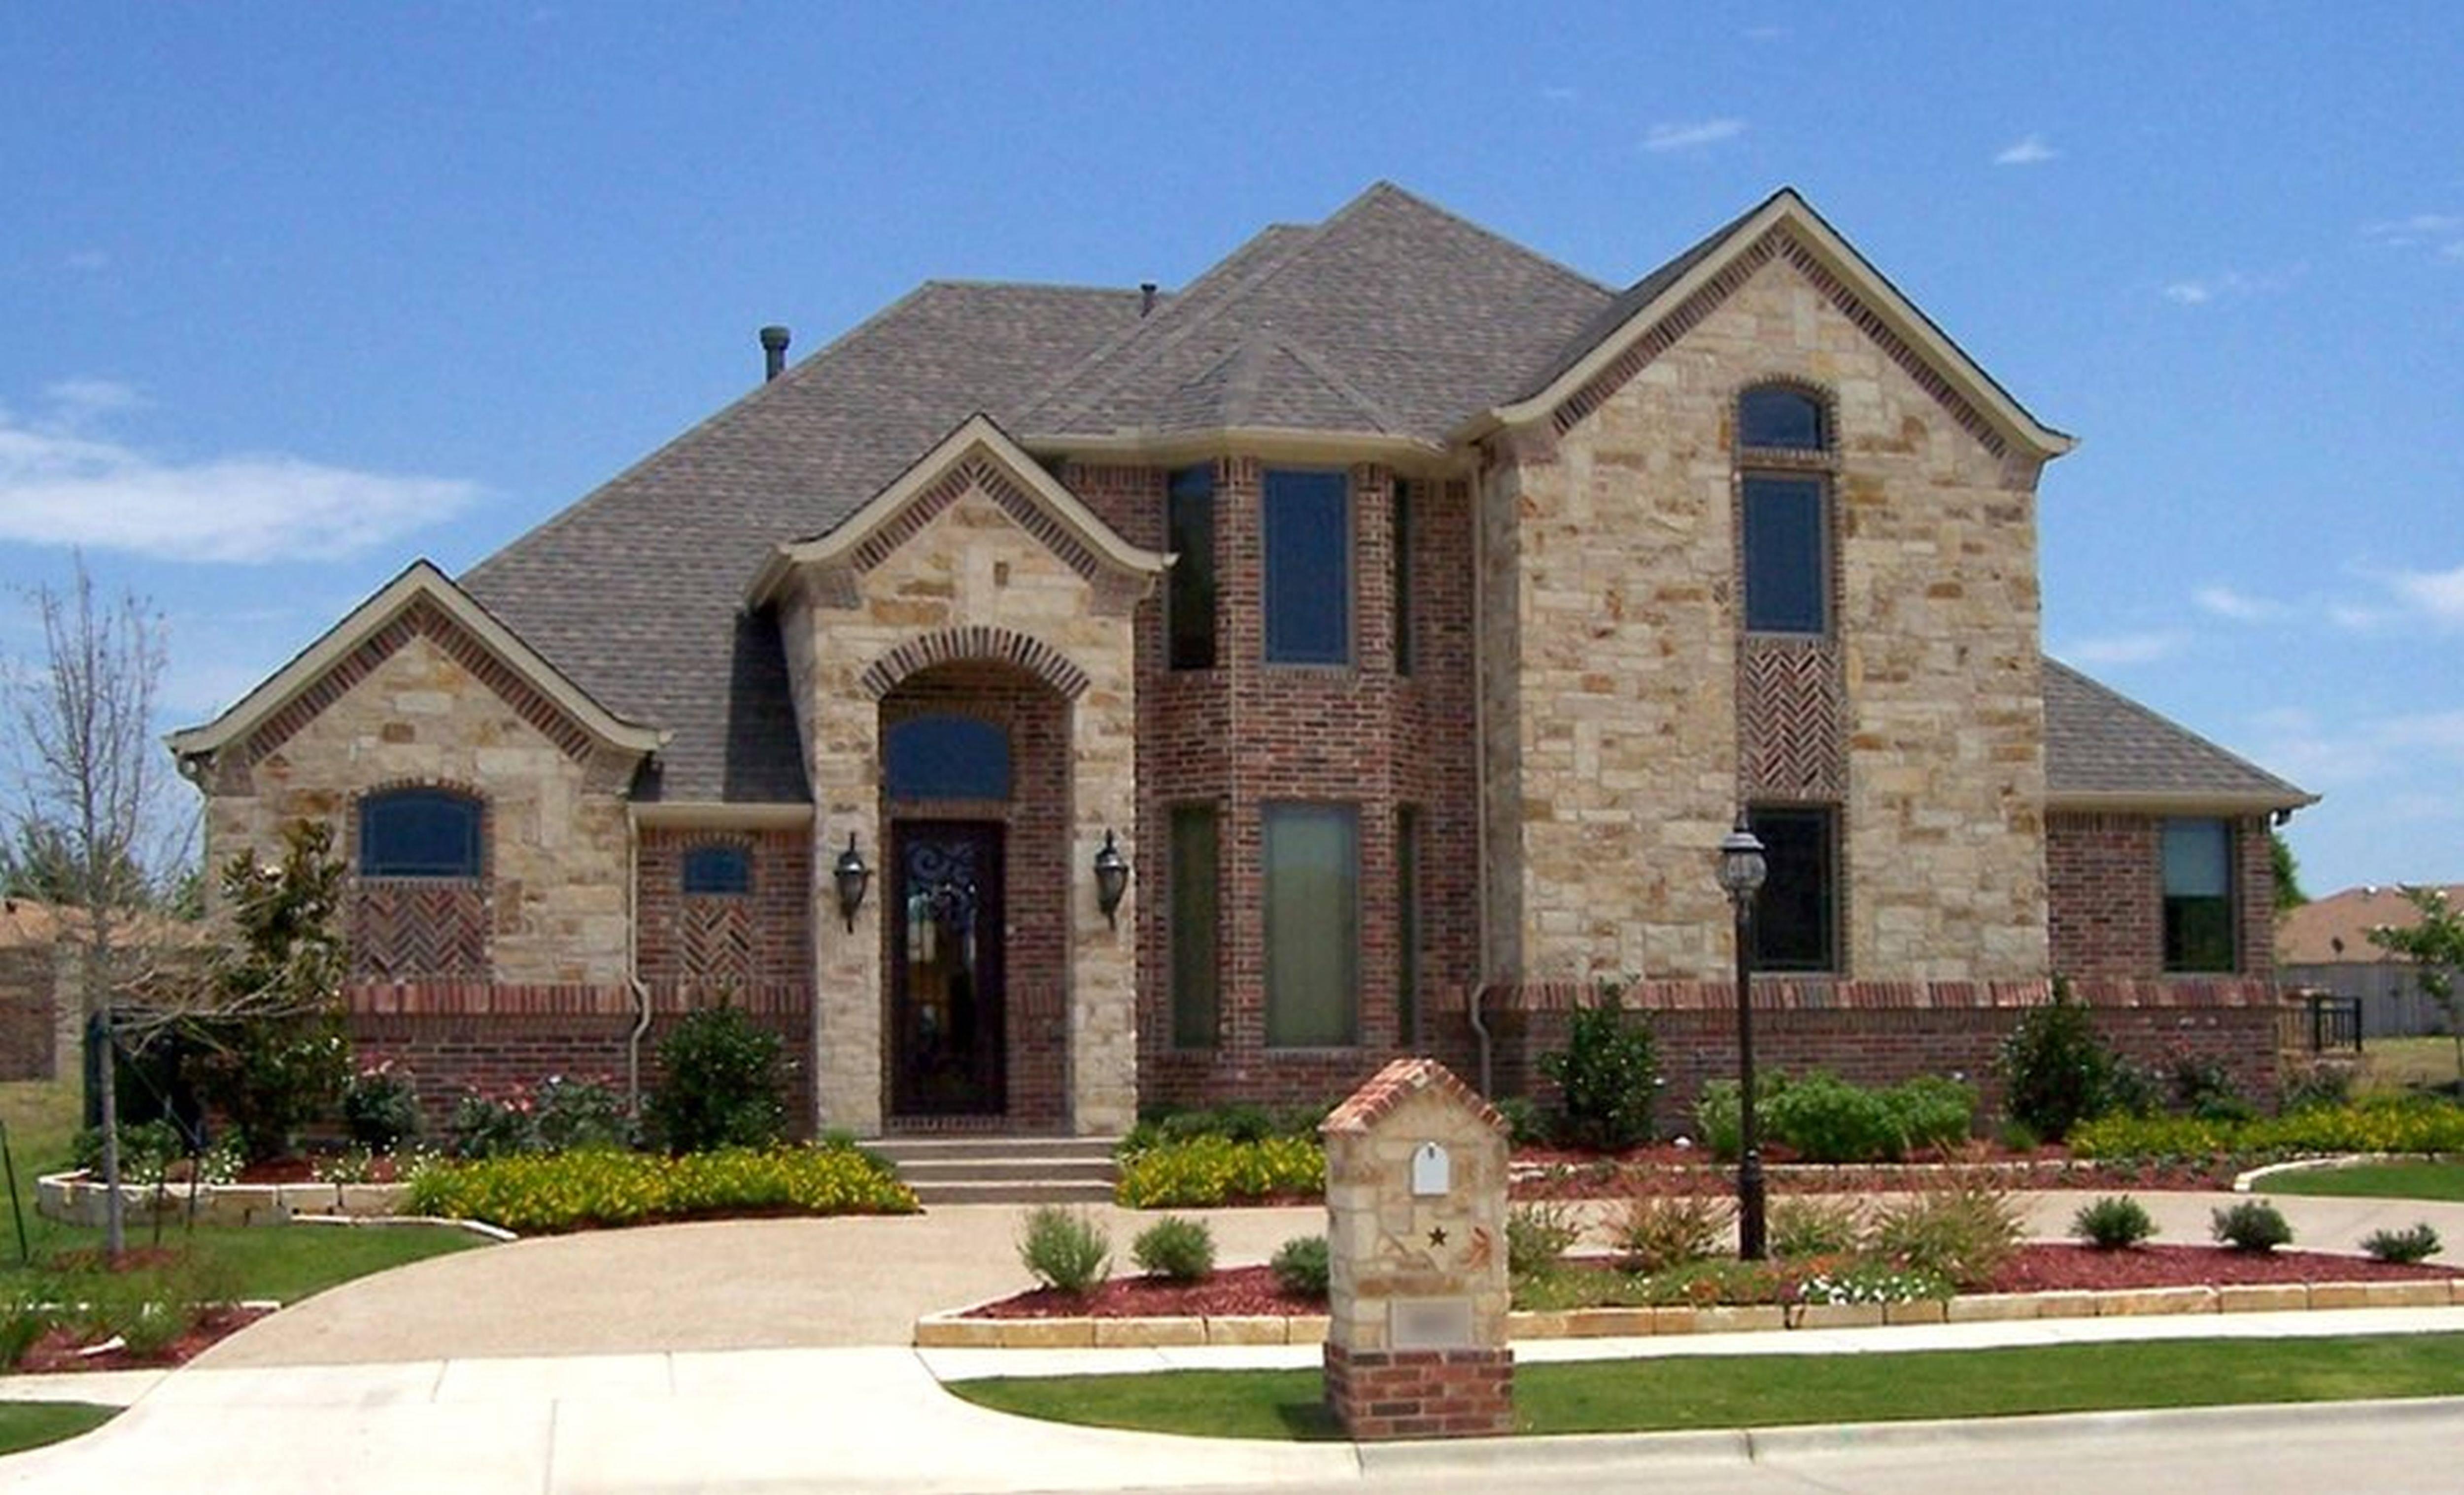 Minecraft Best Modern House Ever Design House Plans 74346